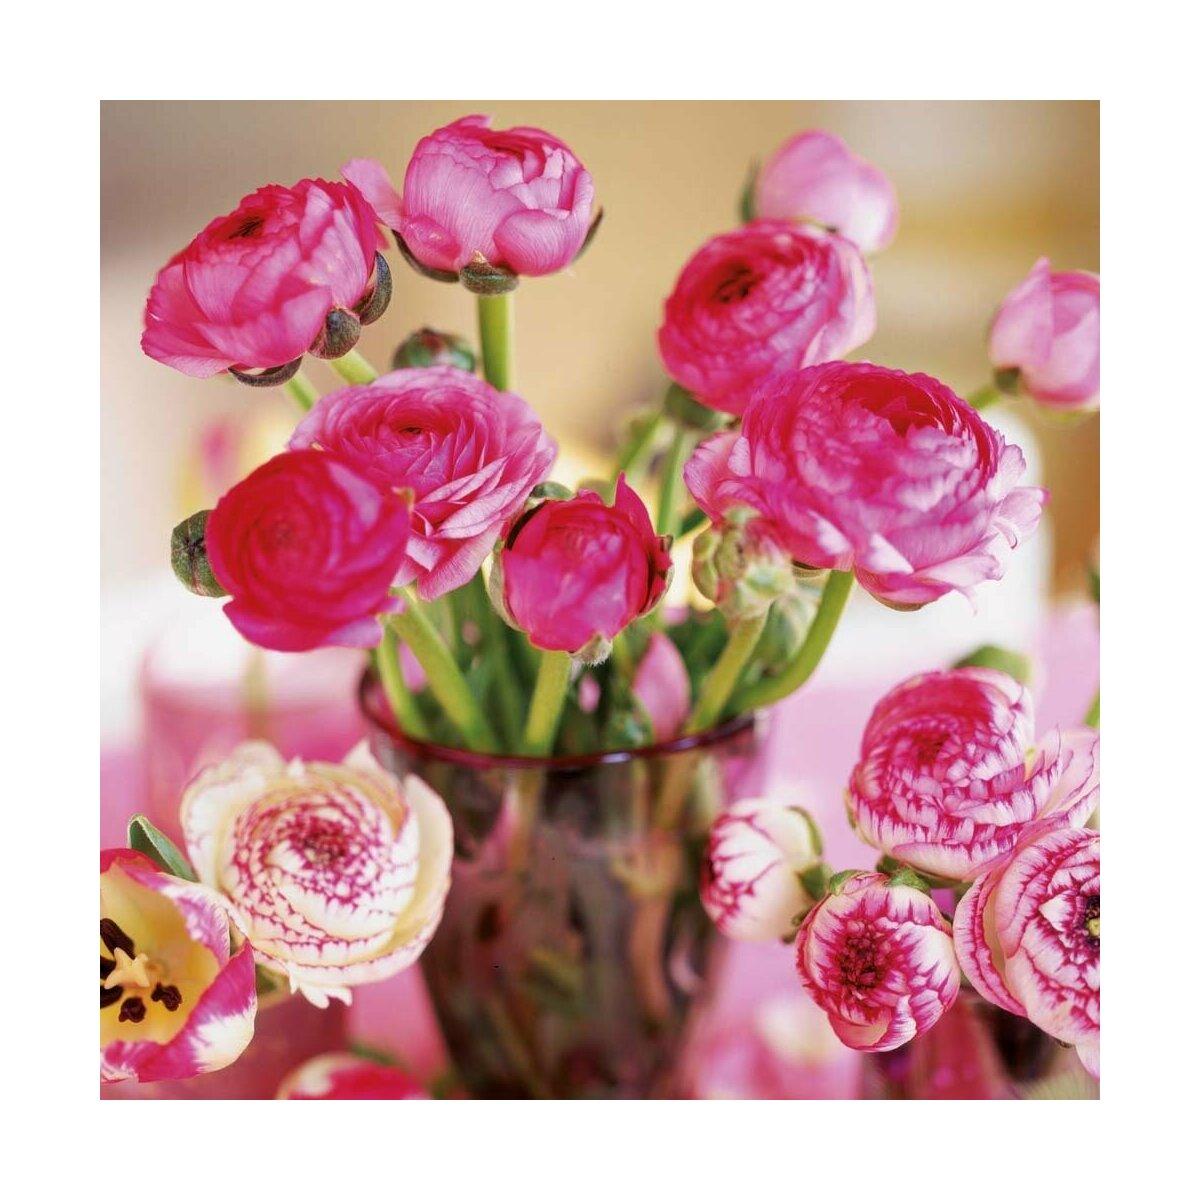 calendrier 2017 bouquets de fleurs du jardin avec poster offer. Black Bedroom Furniture Sets. Home Design Ideas